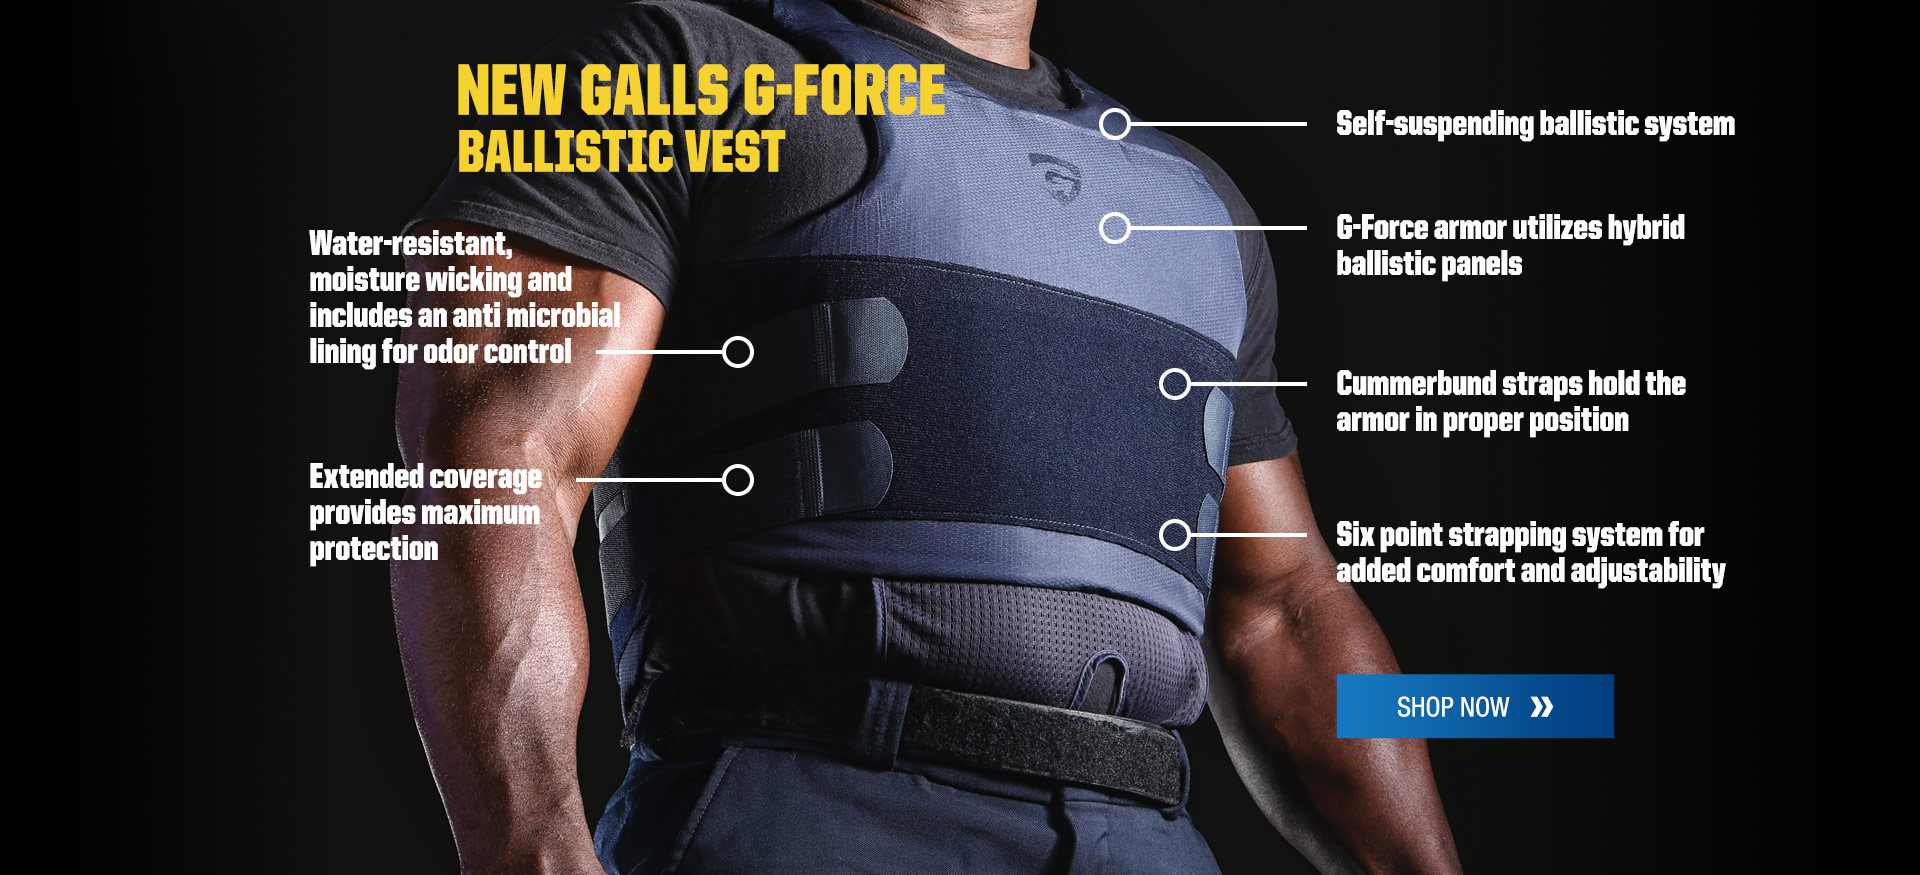 New Galls G-Force ballistic vest